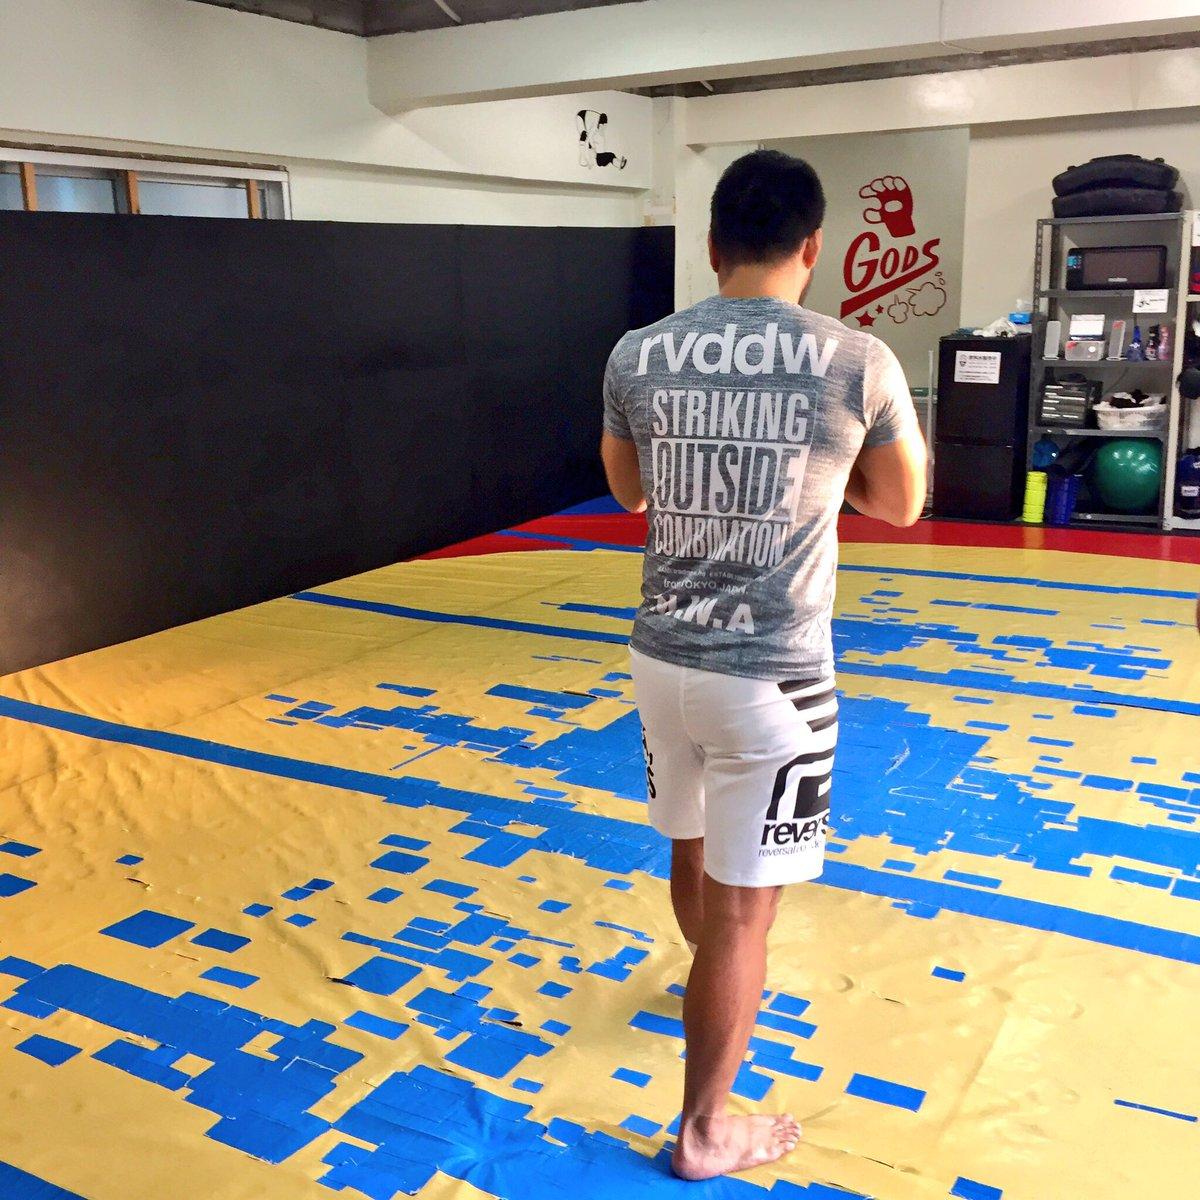 Hideo Itami training camp. #HideoItami #WWE #WWENXT #rvddw